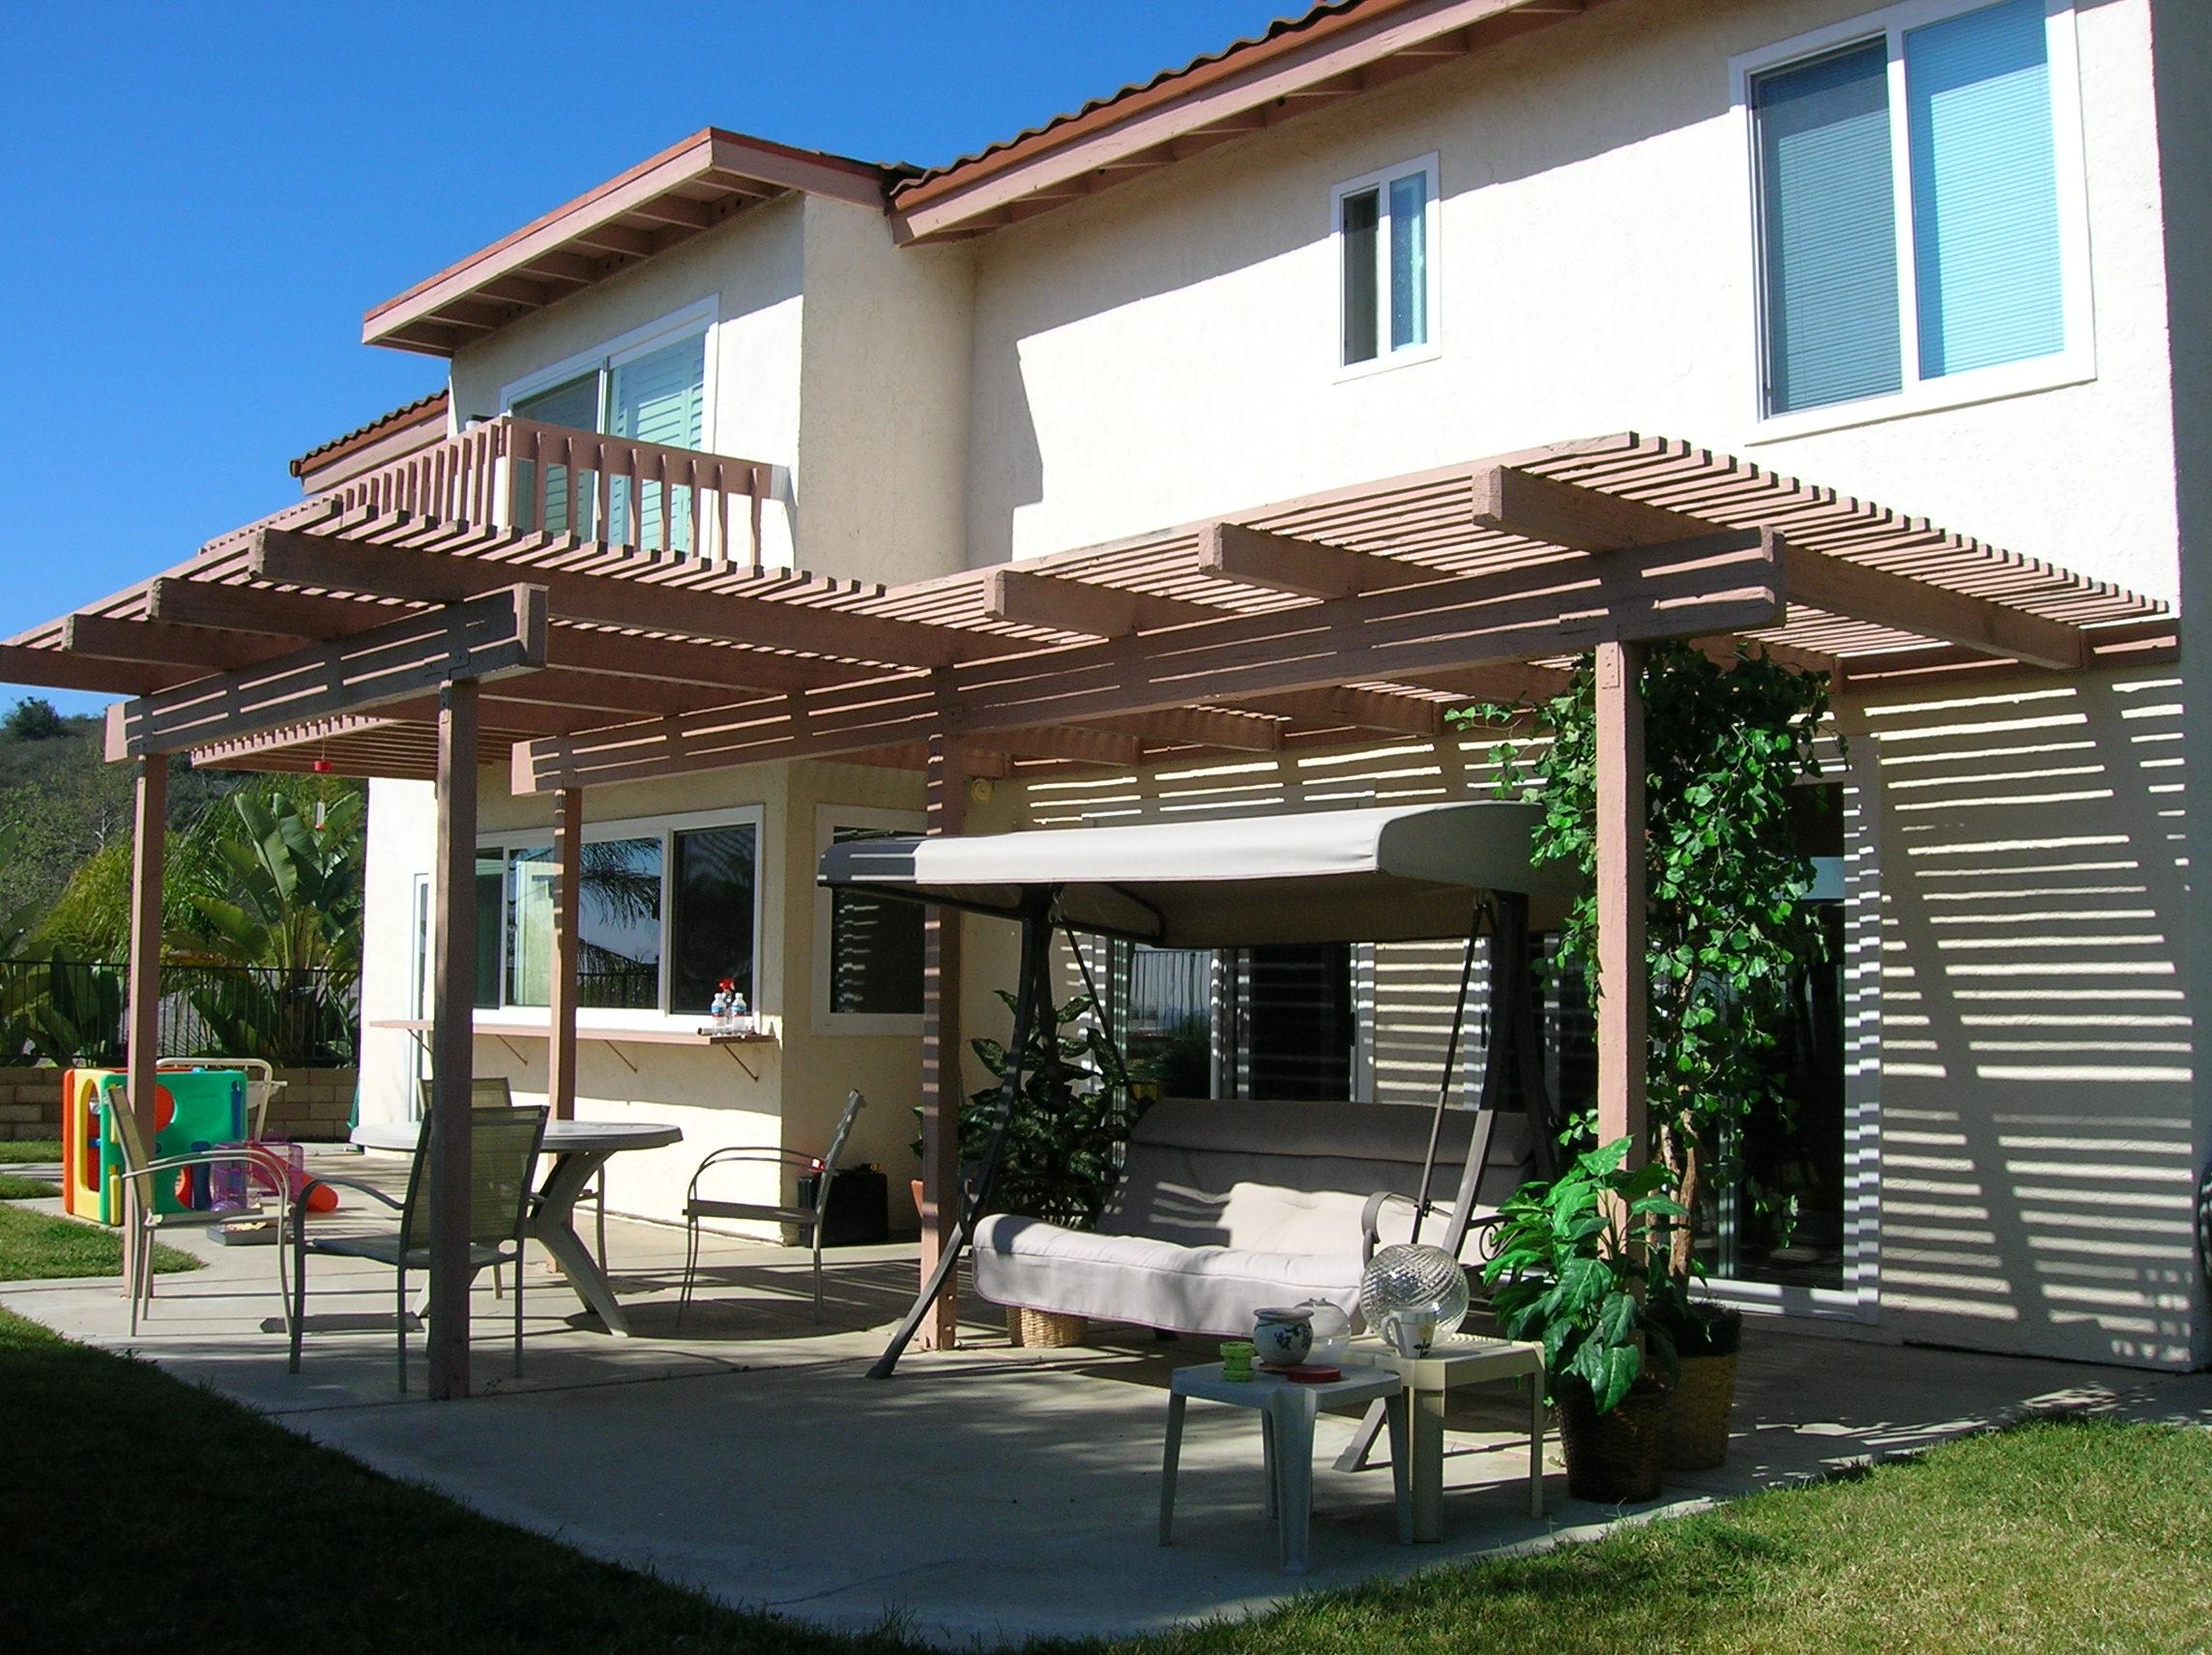 Open Patio Cover Home Design Ideas and